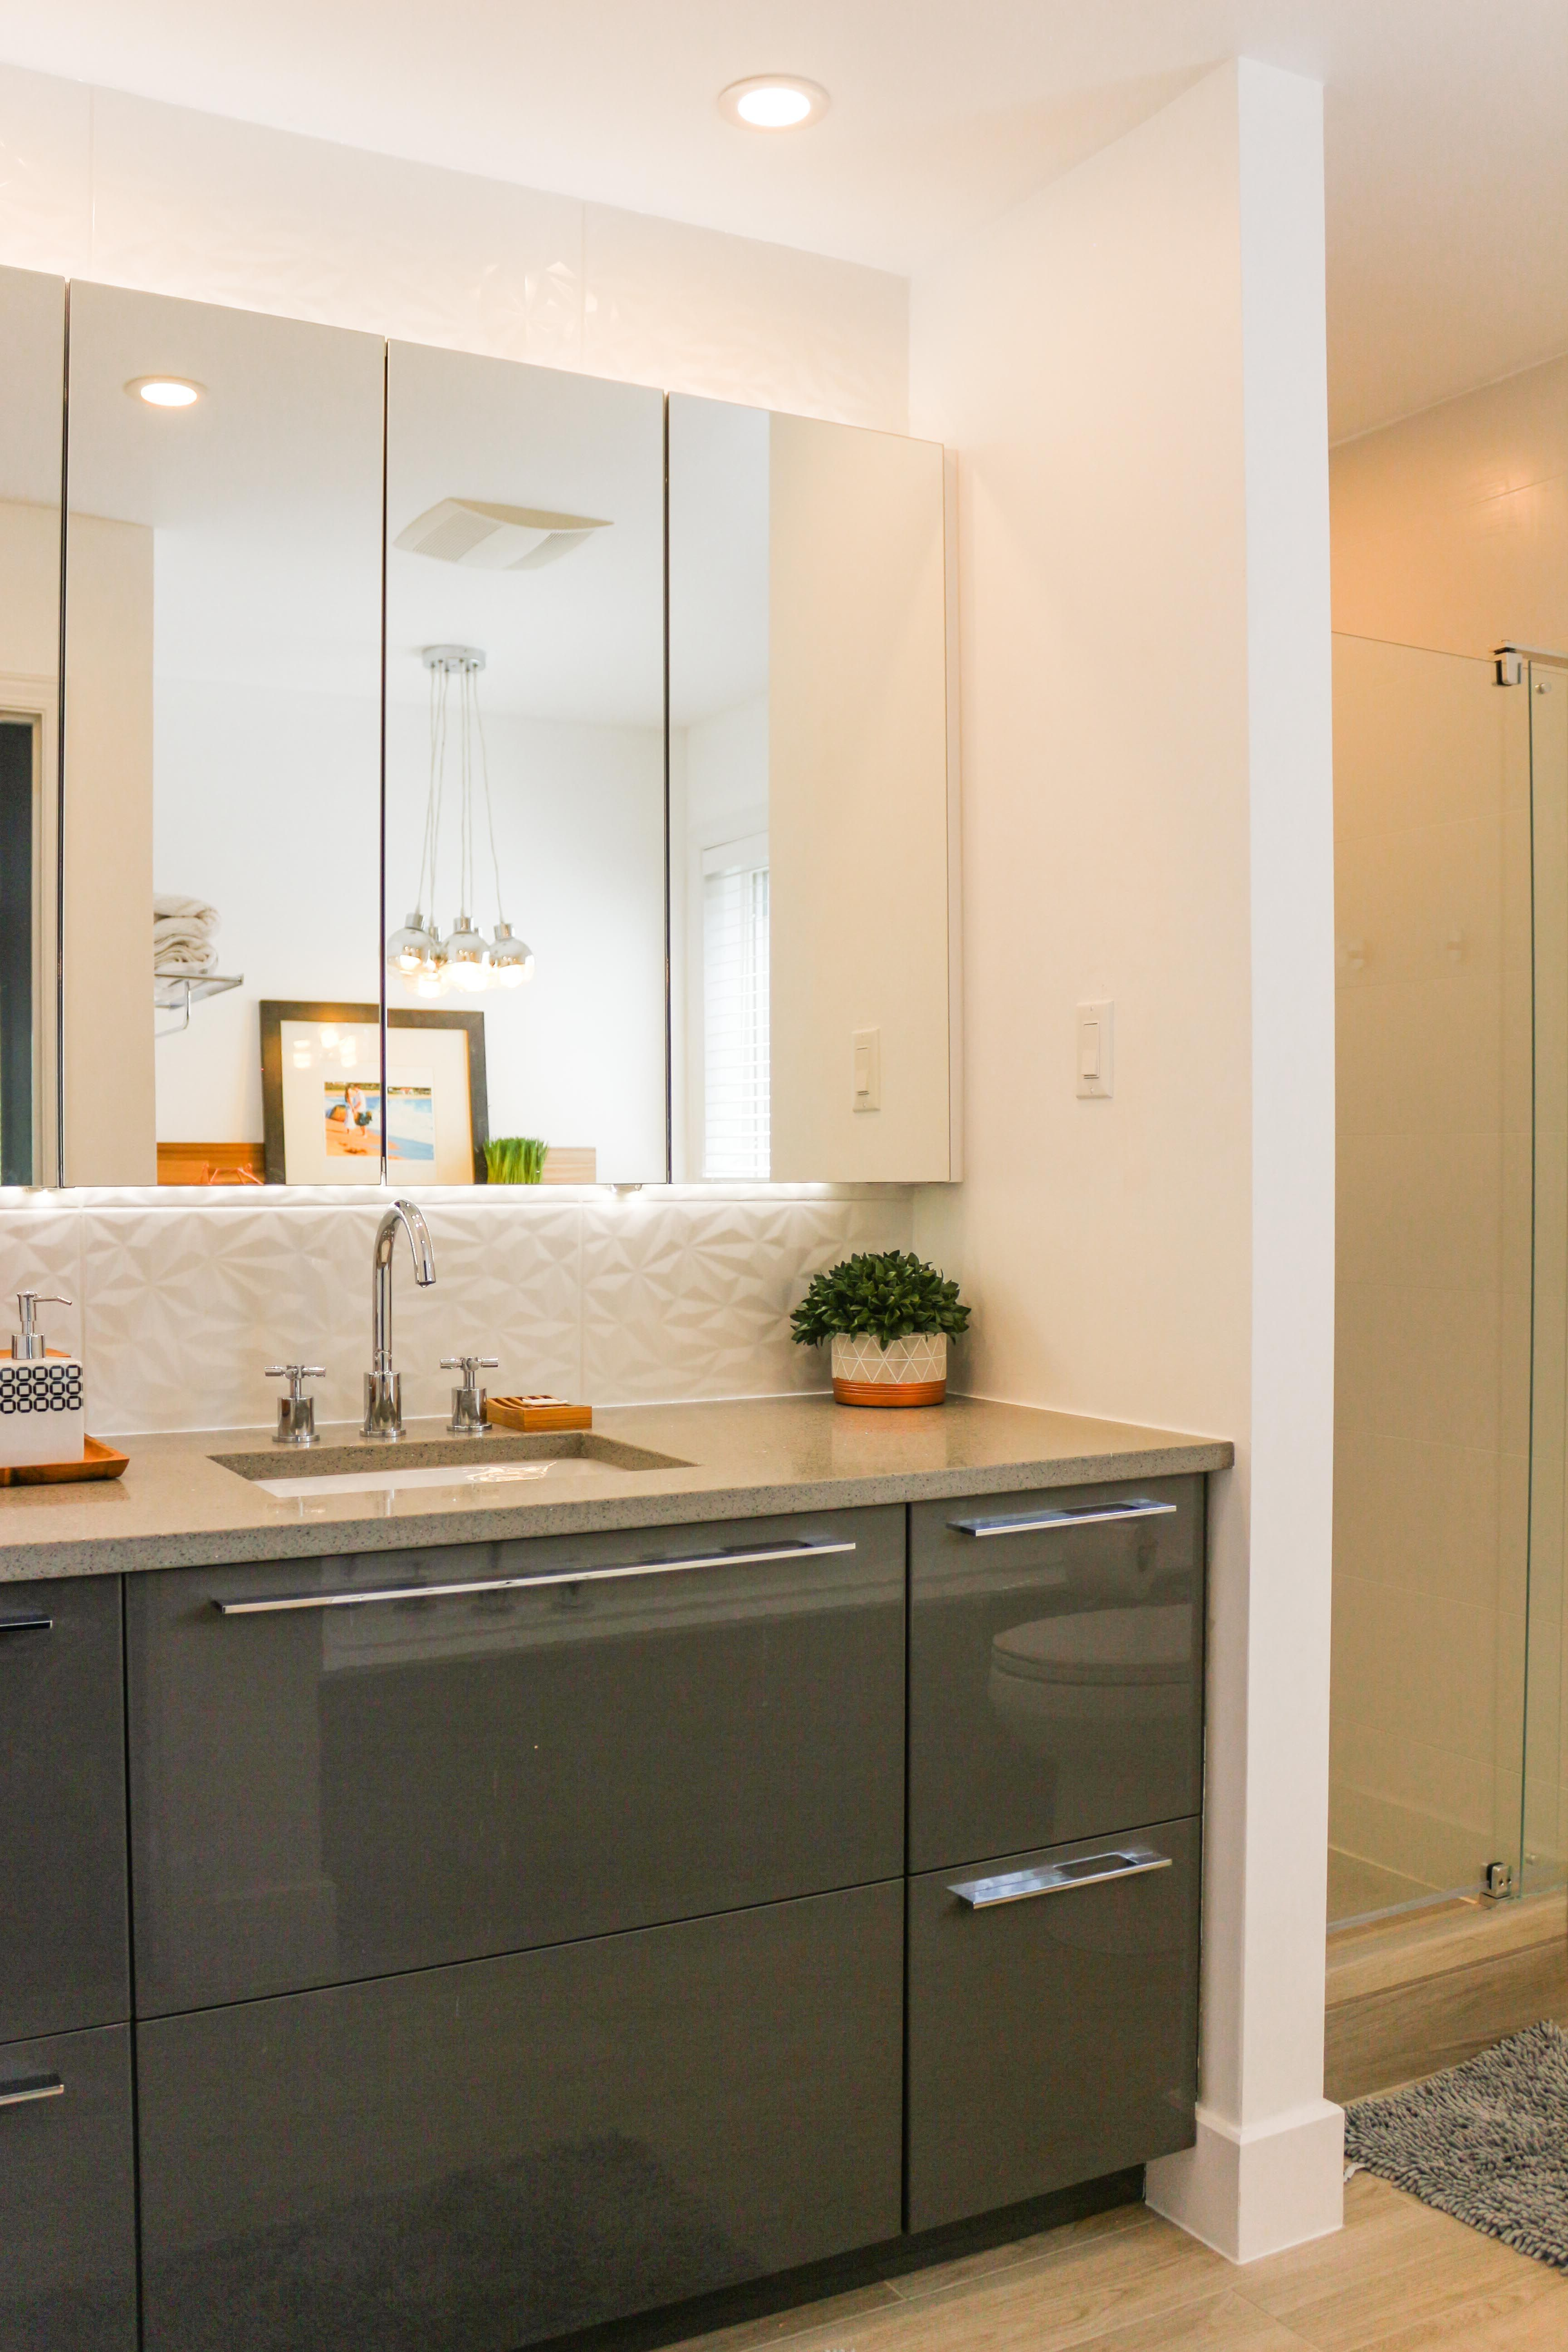 Salle De Bain Ottawa ~ master bathroom renovation with high gloss vanity and mirrored